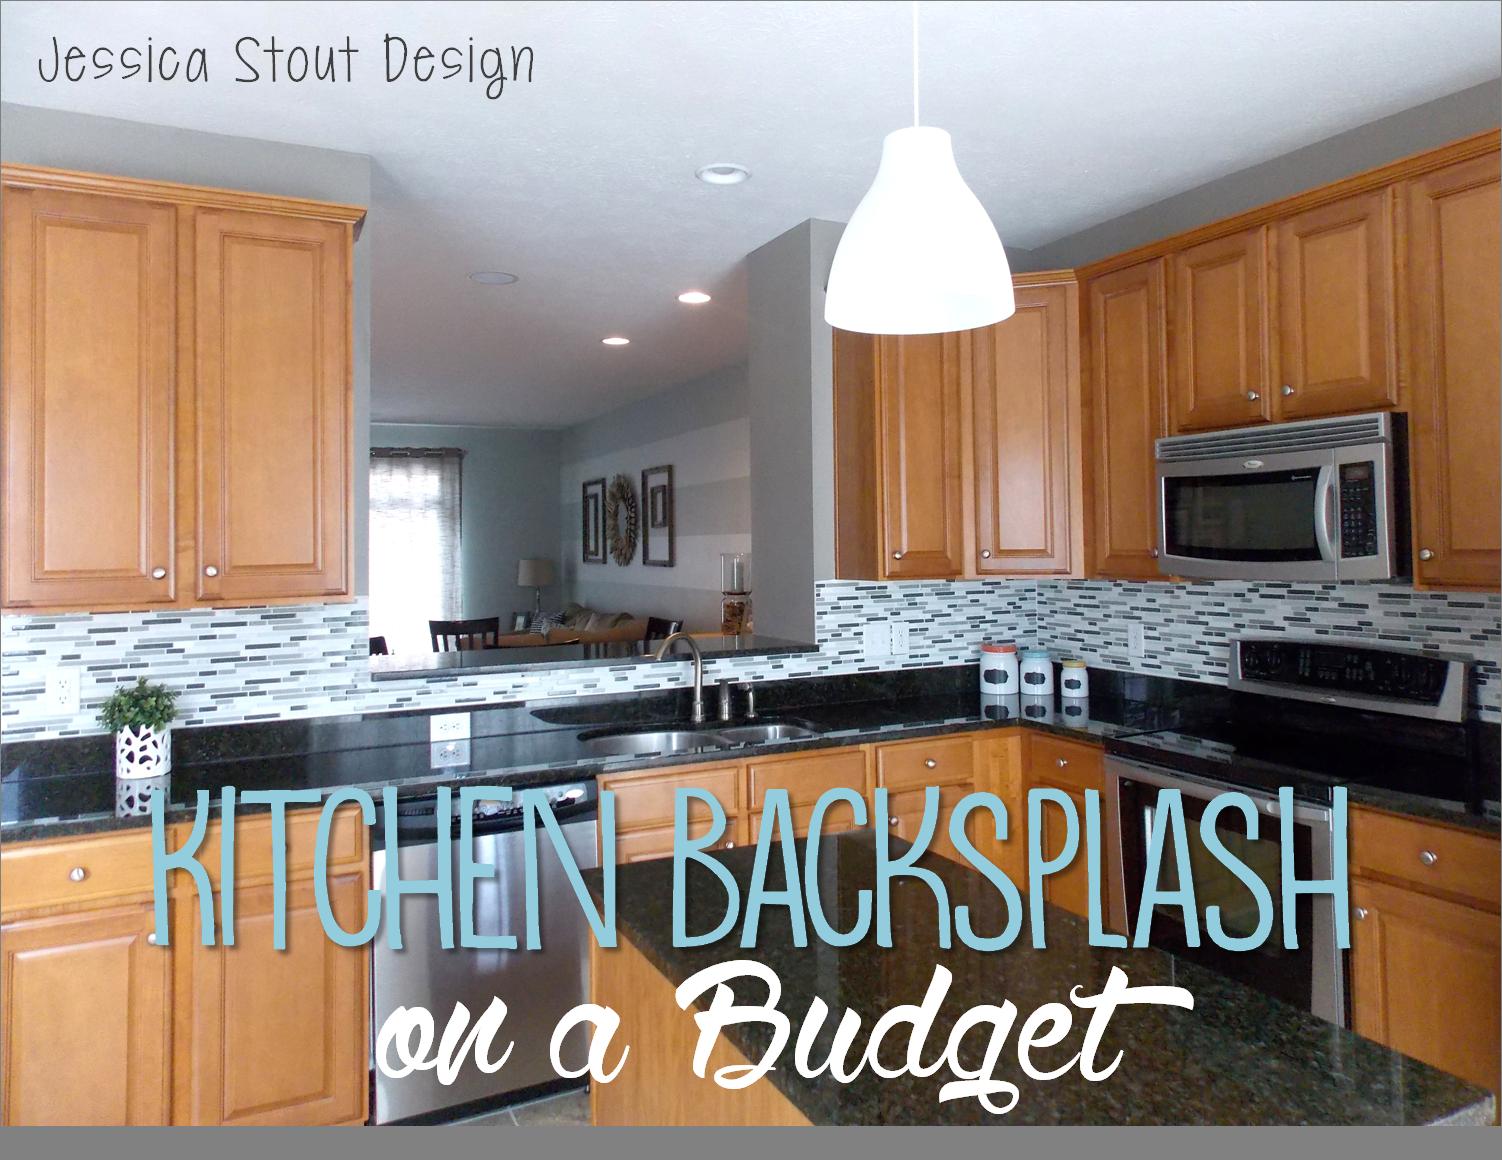 - Kitchen Backsplash On A Budget - Tile Lowes Venatino Mixed